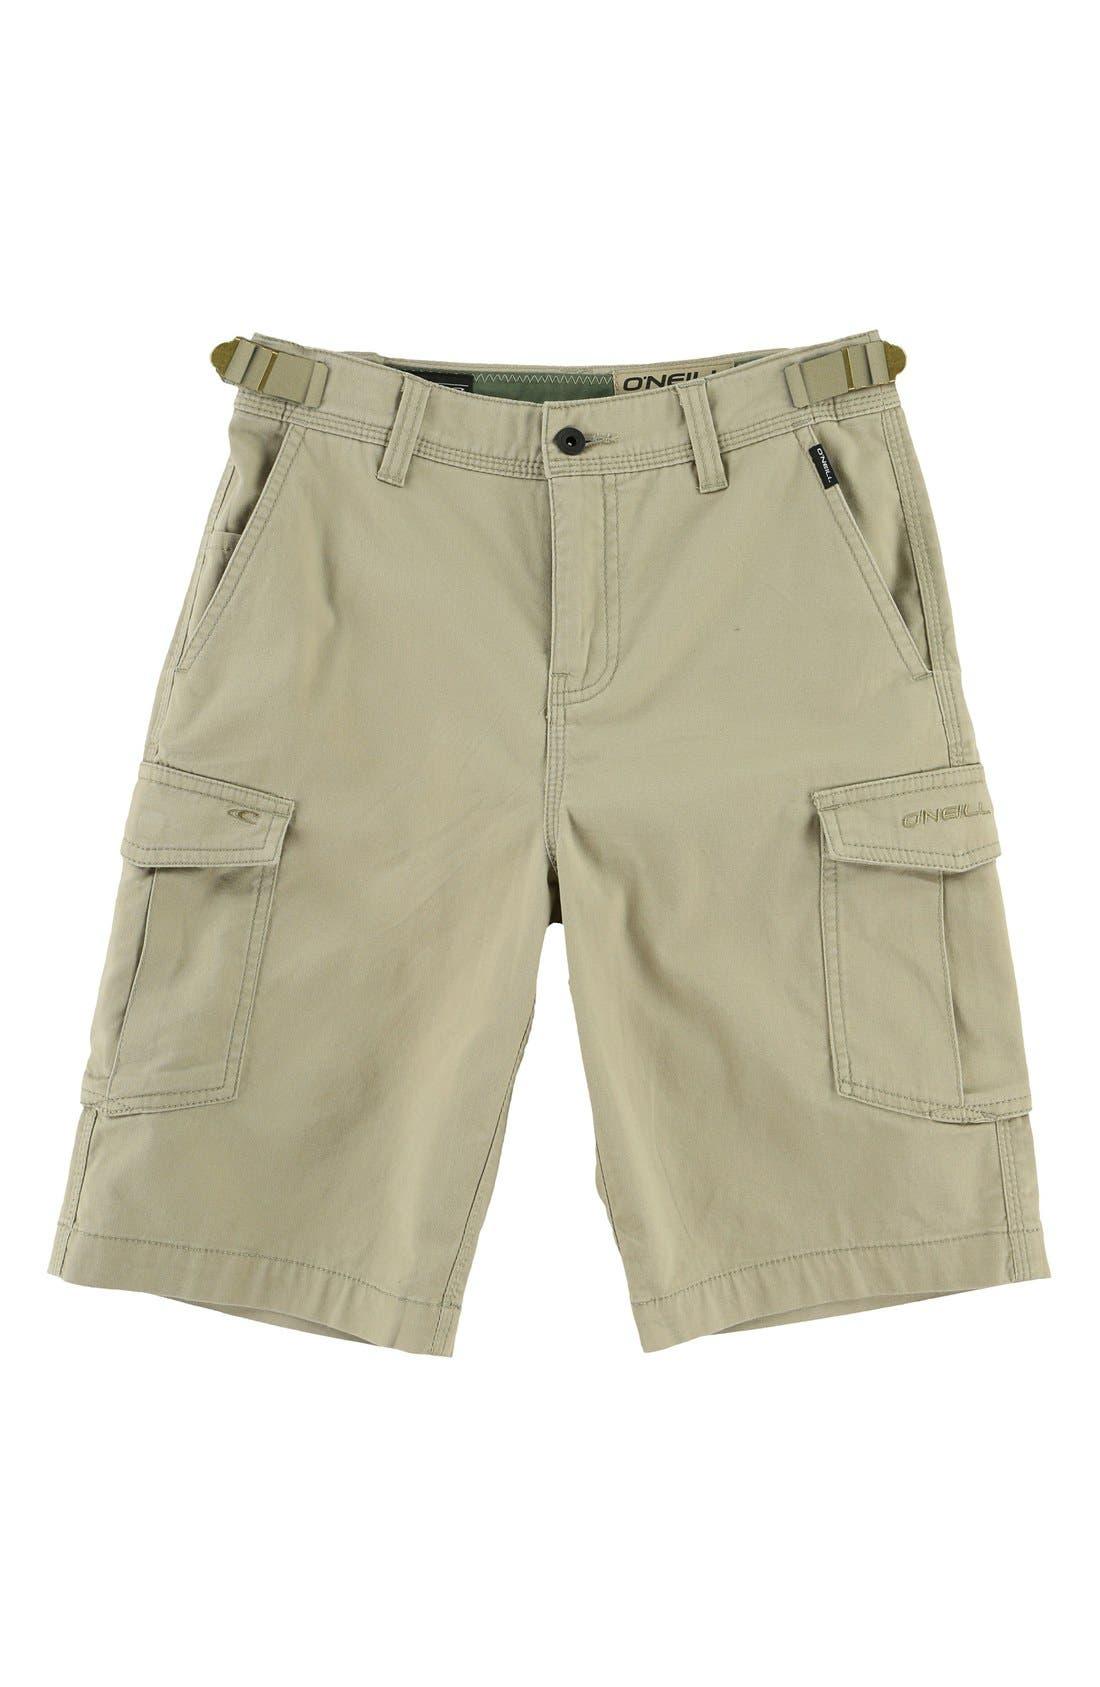 El Toro Cargo Shorts,                             Main thumbnail 1, color,                             Khaki